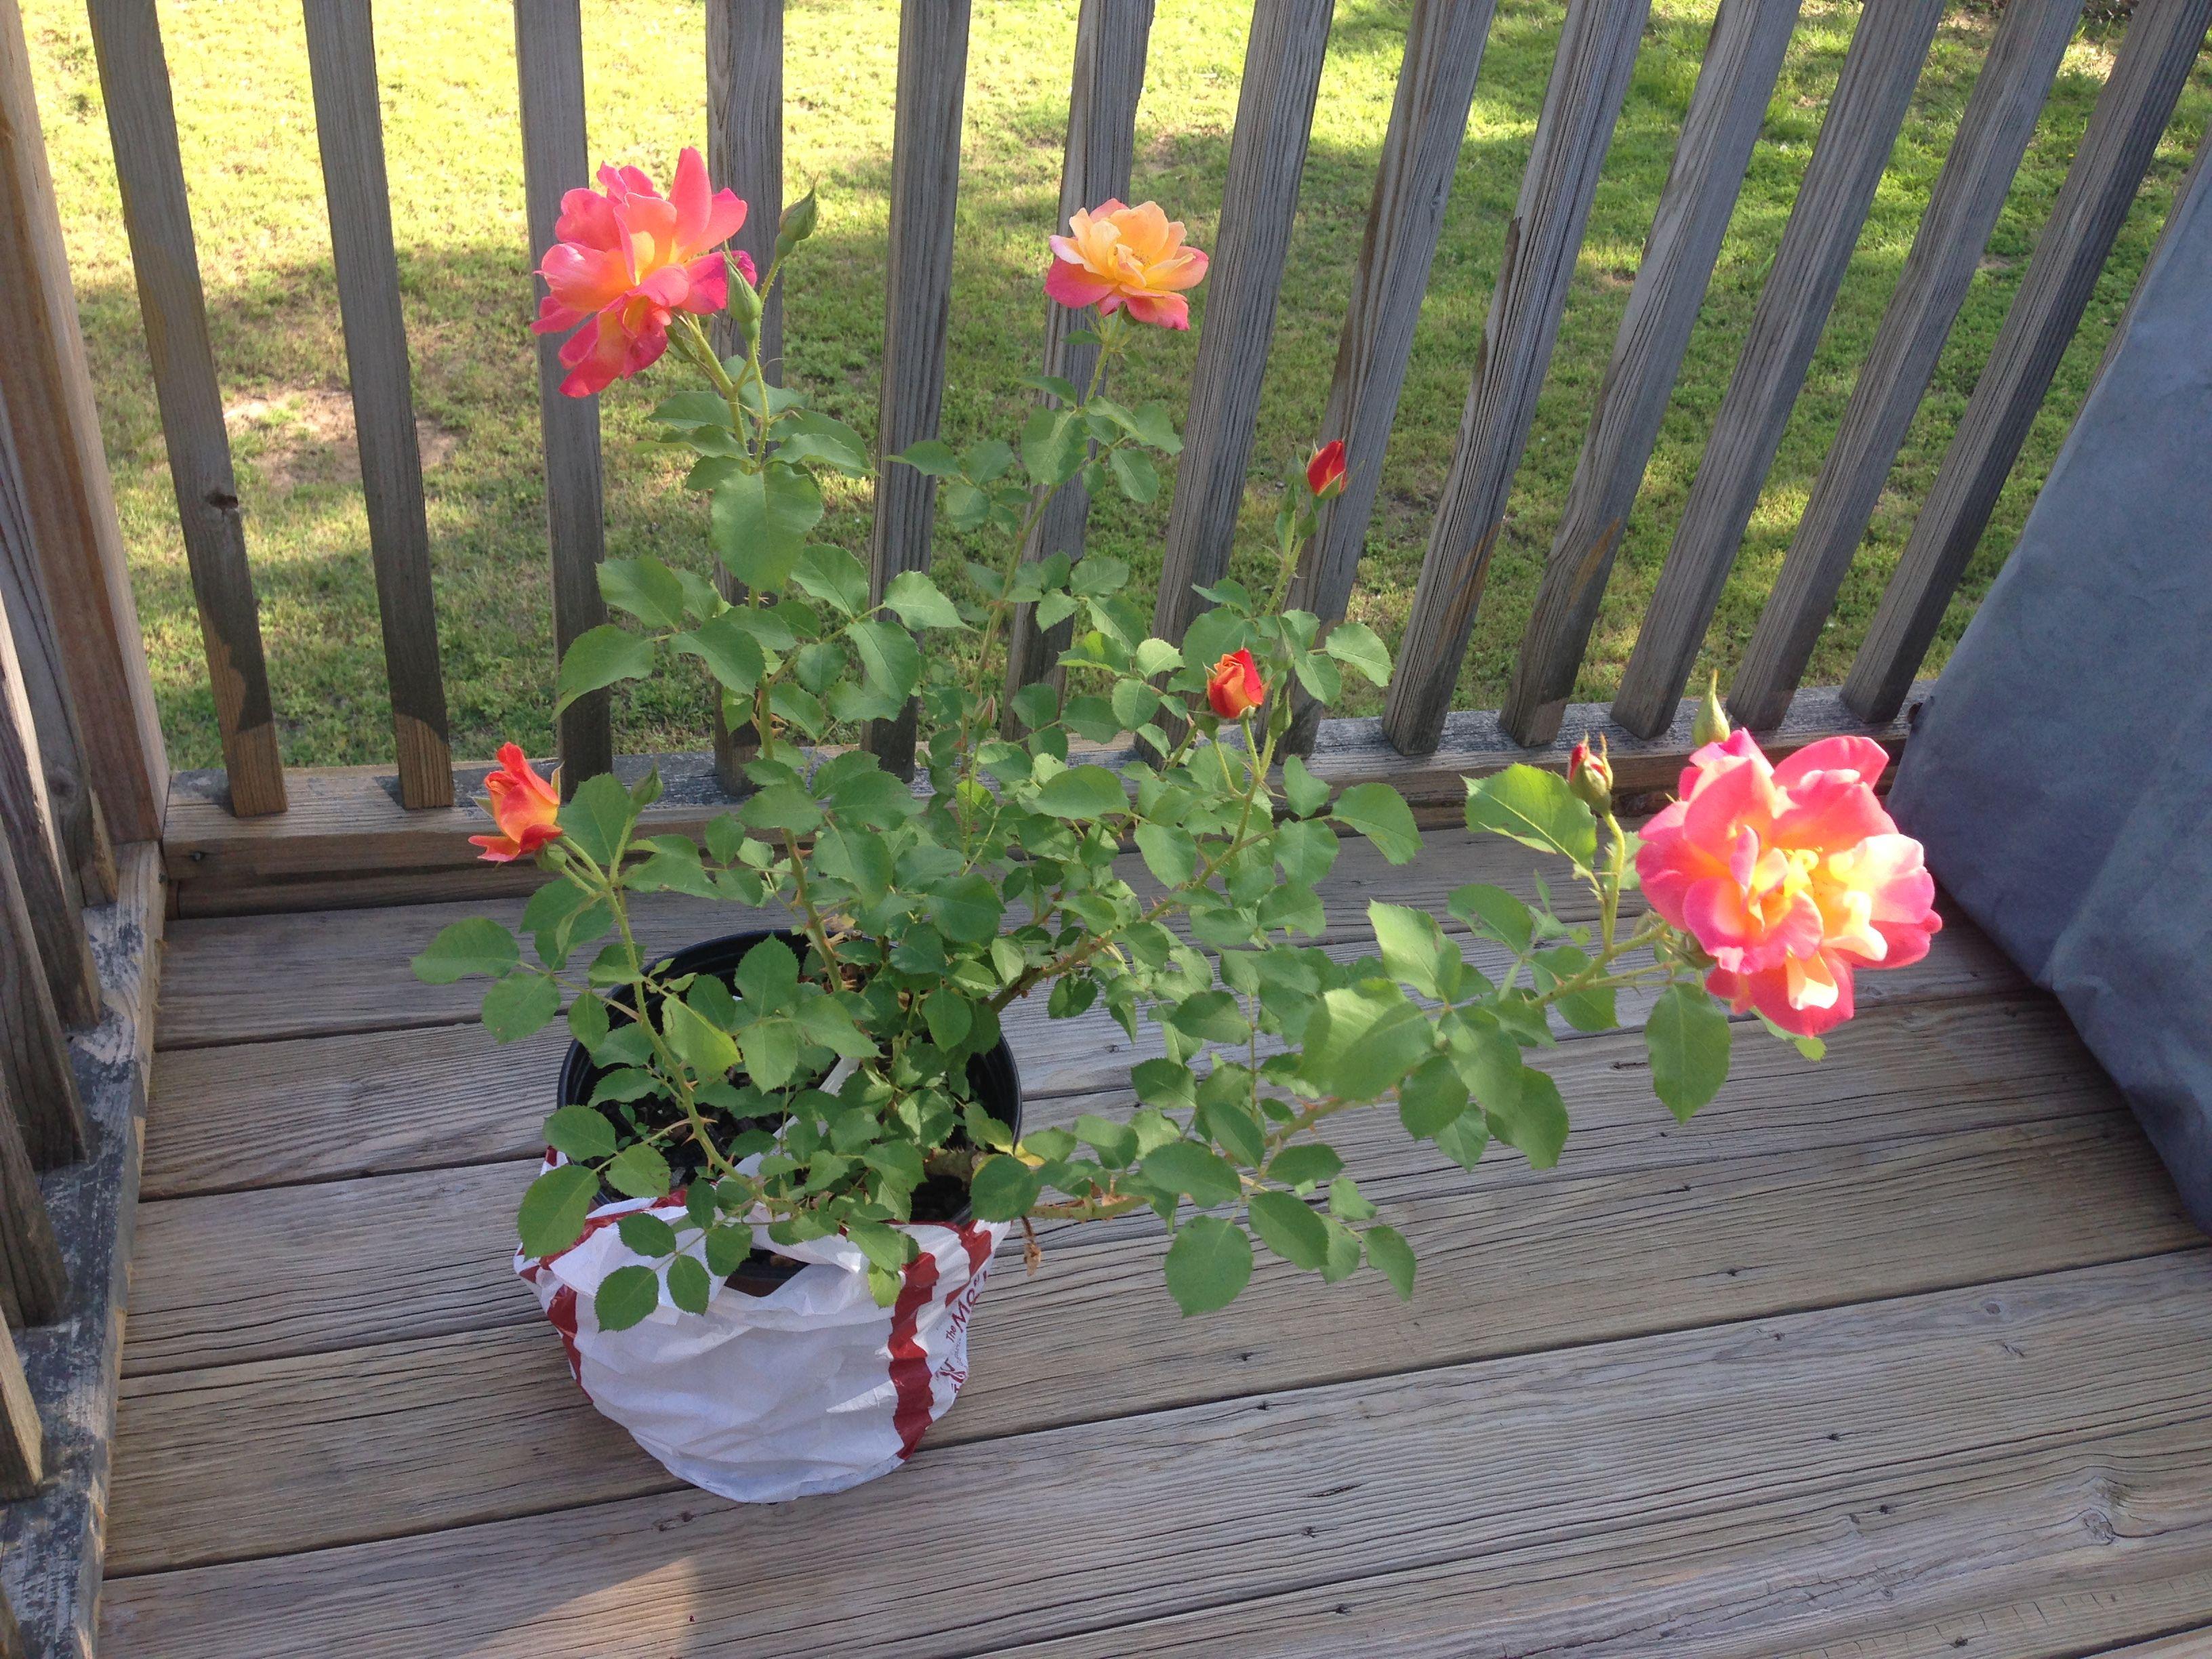 Ho/how to take care of climbing roses for winter - Joseph S Coat Climbing Rose The Good Earth Garden Center Little Rock